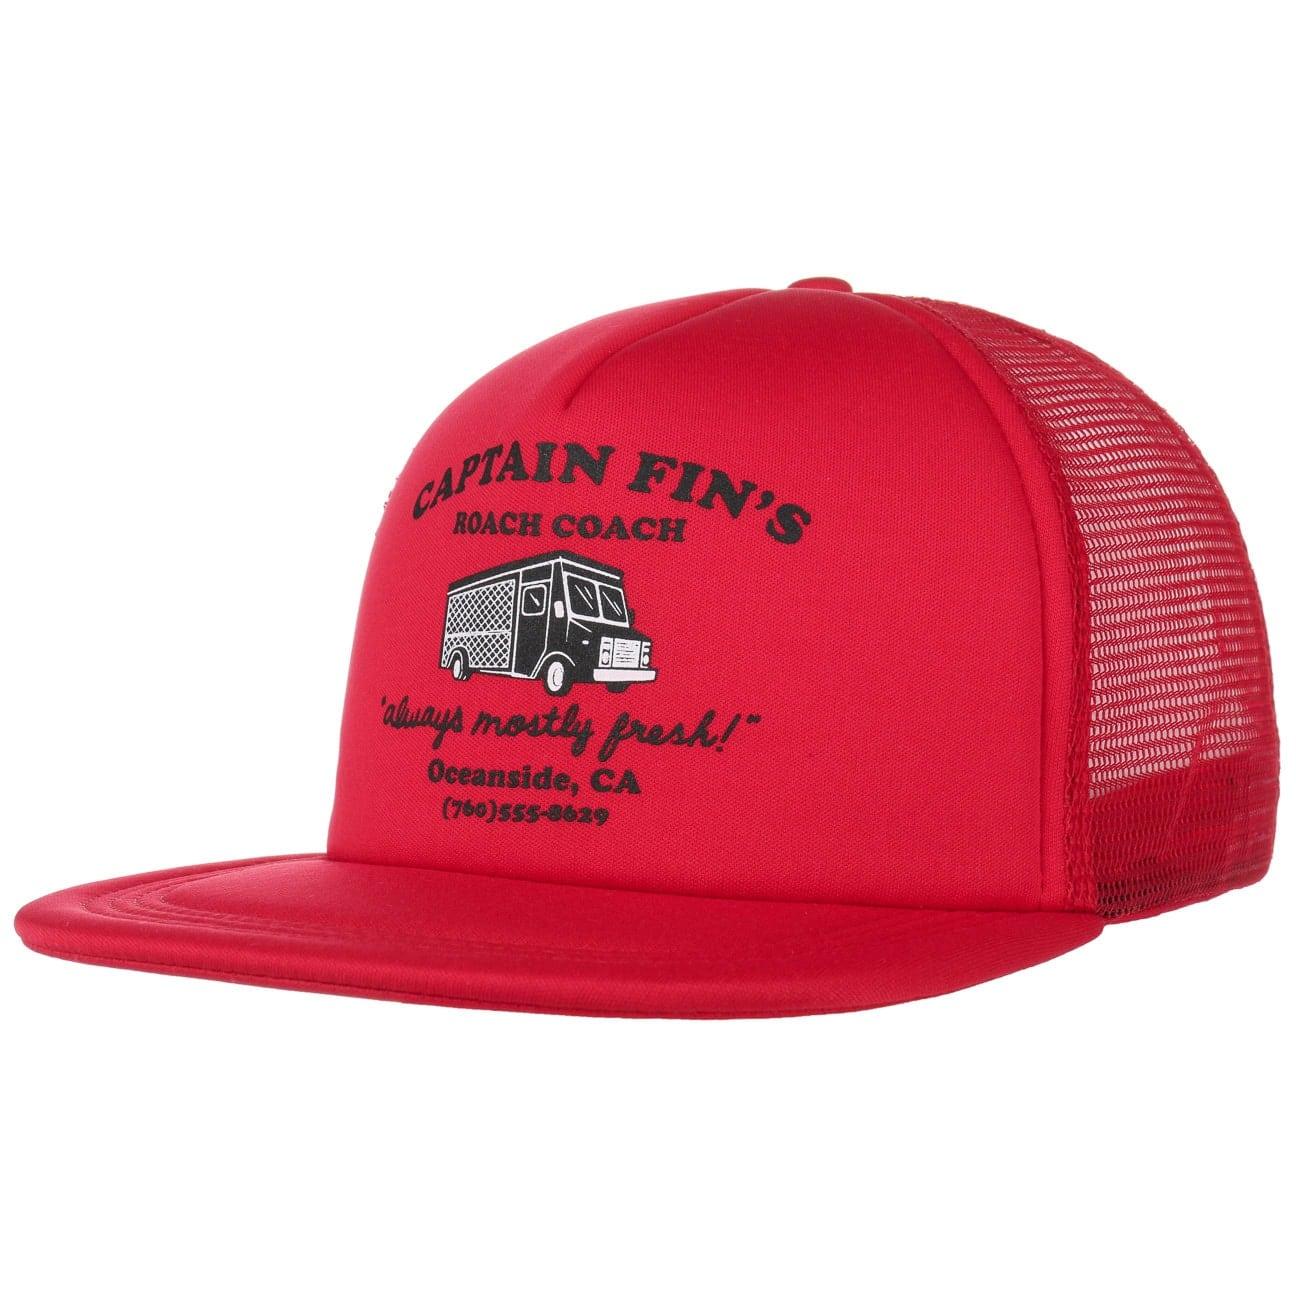 Casquette Trucker Oceanside by Captain Fin  casquette de baseball